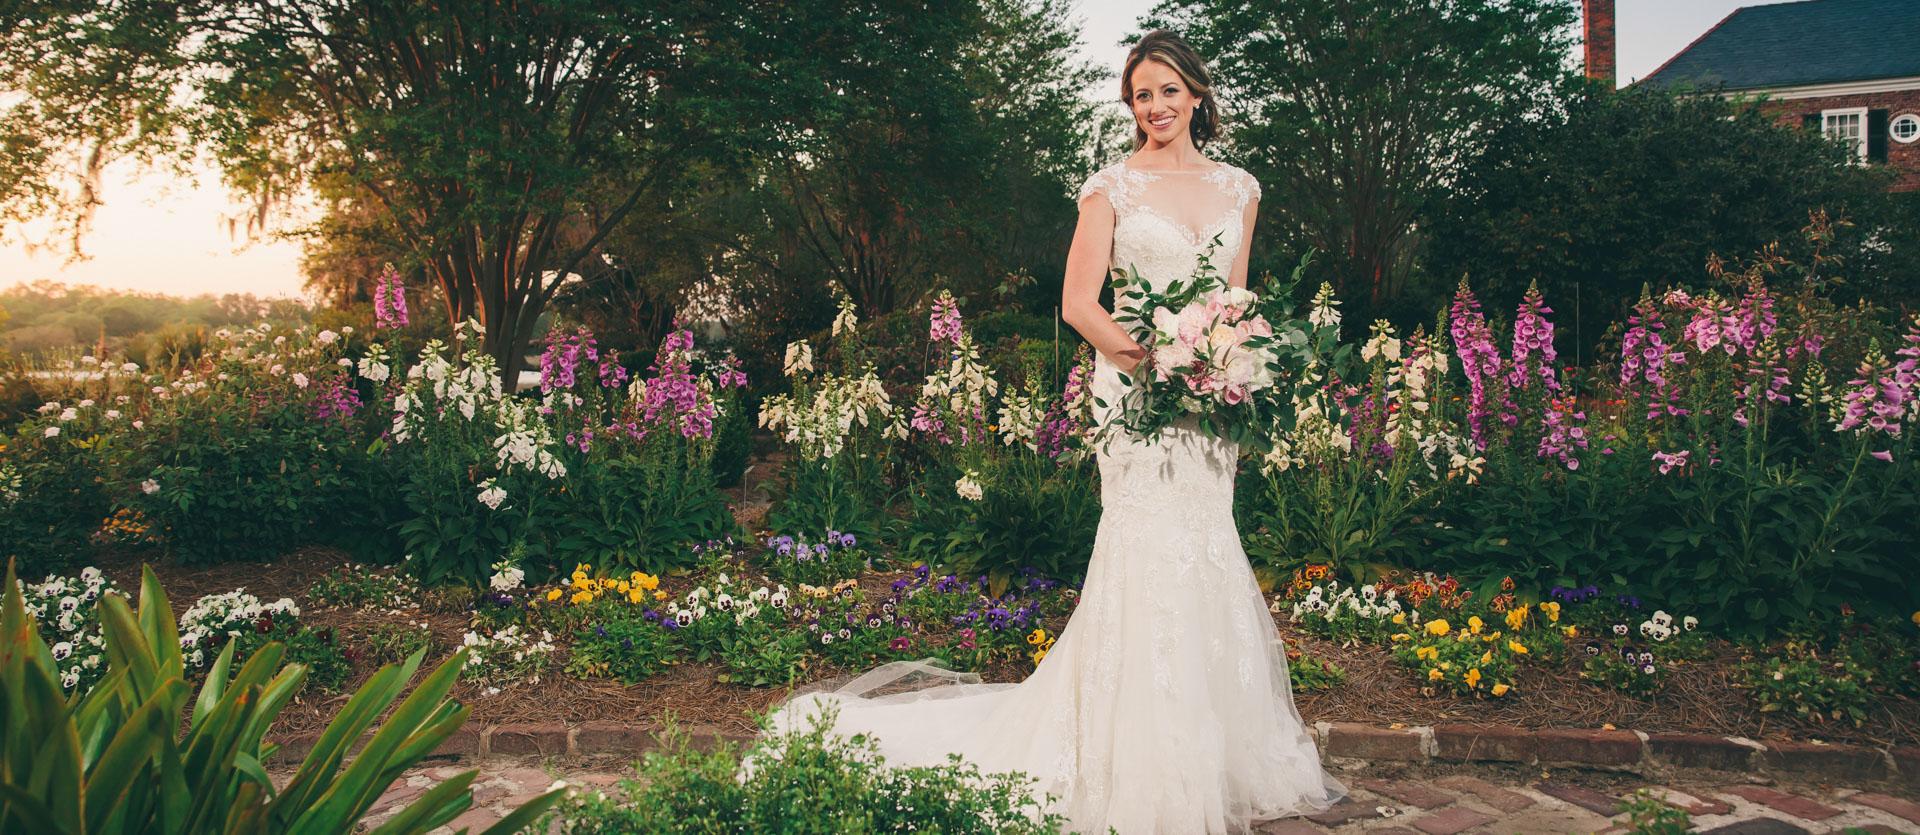 Cassandra the Bride